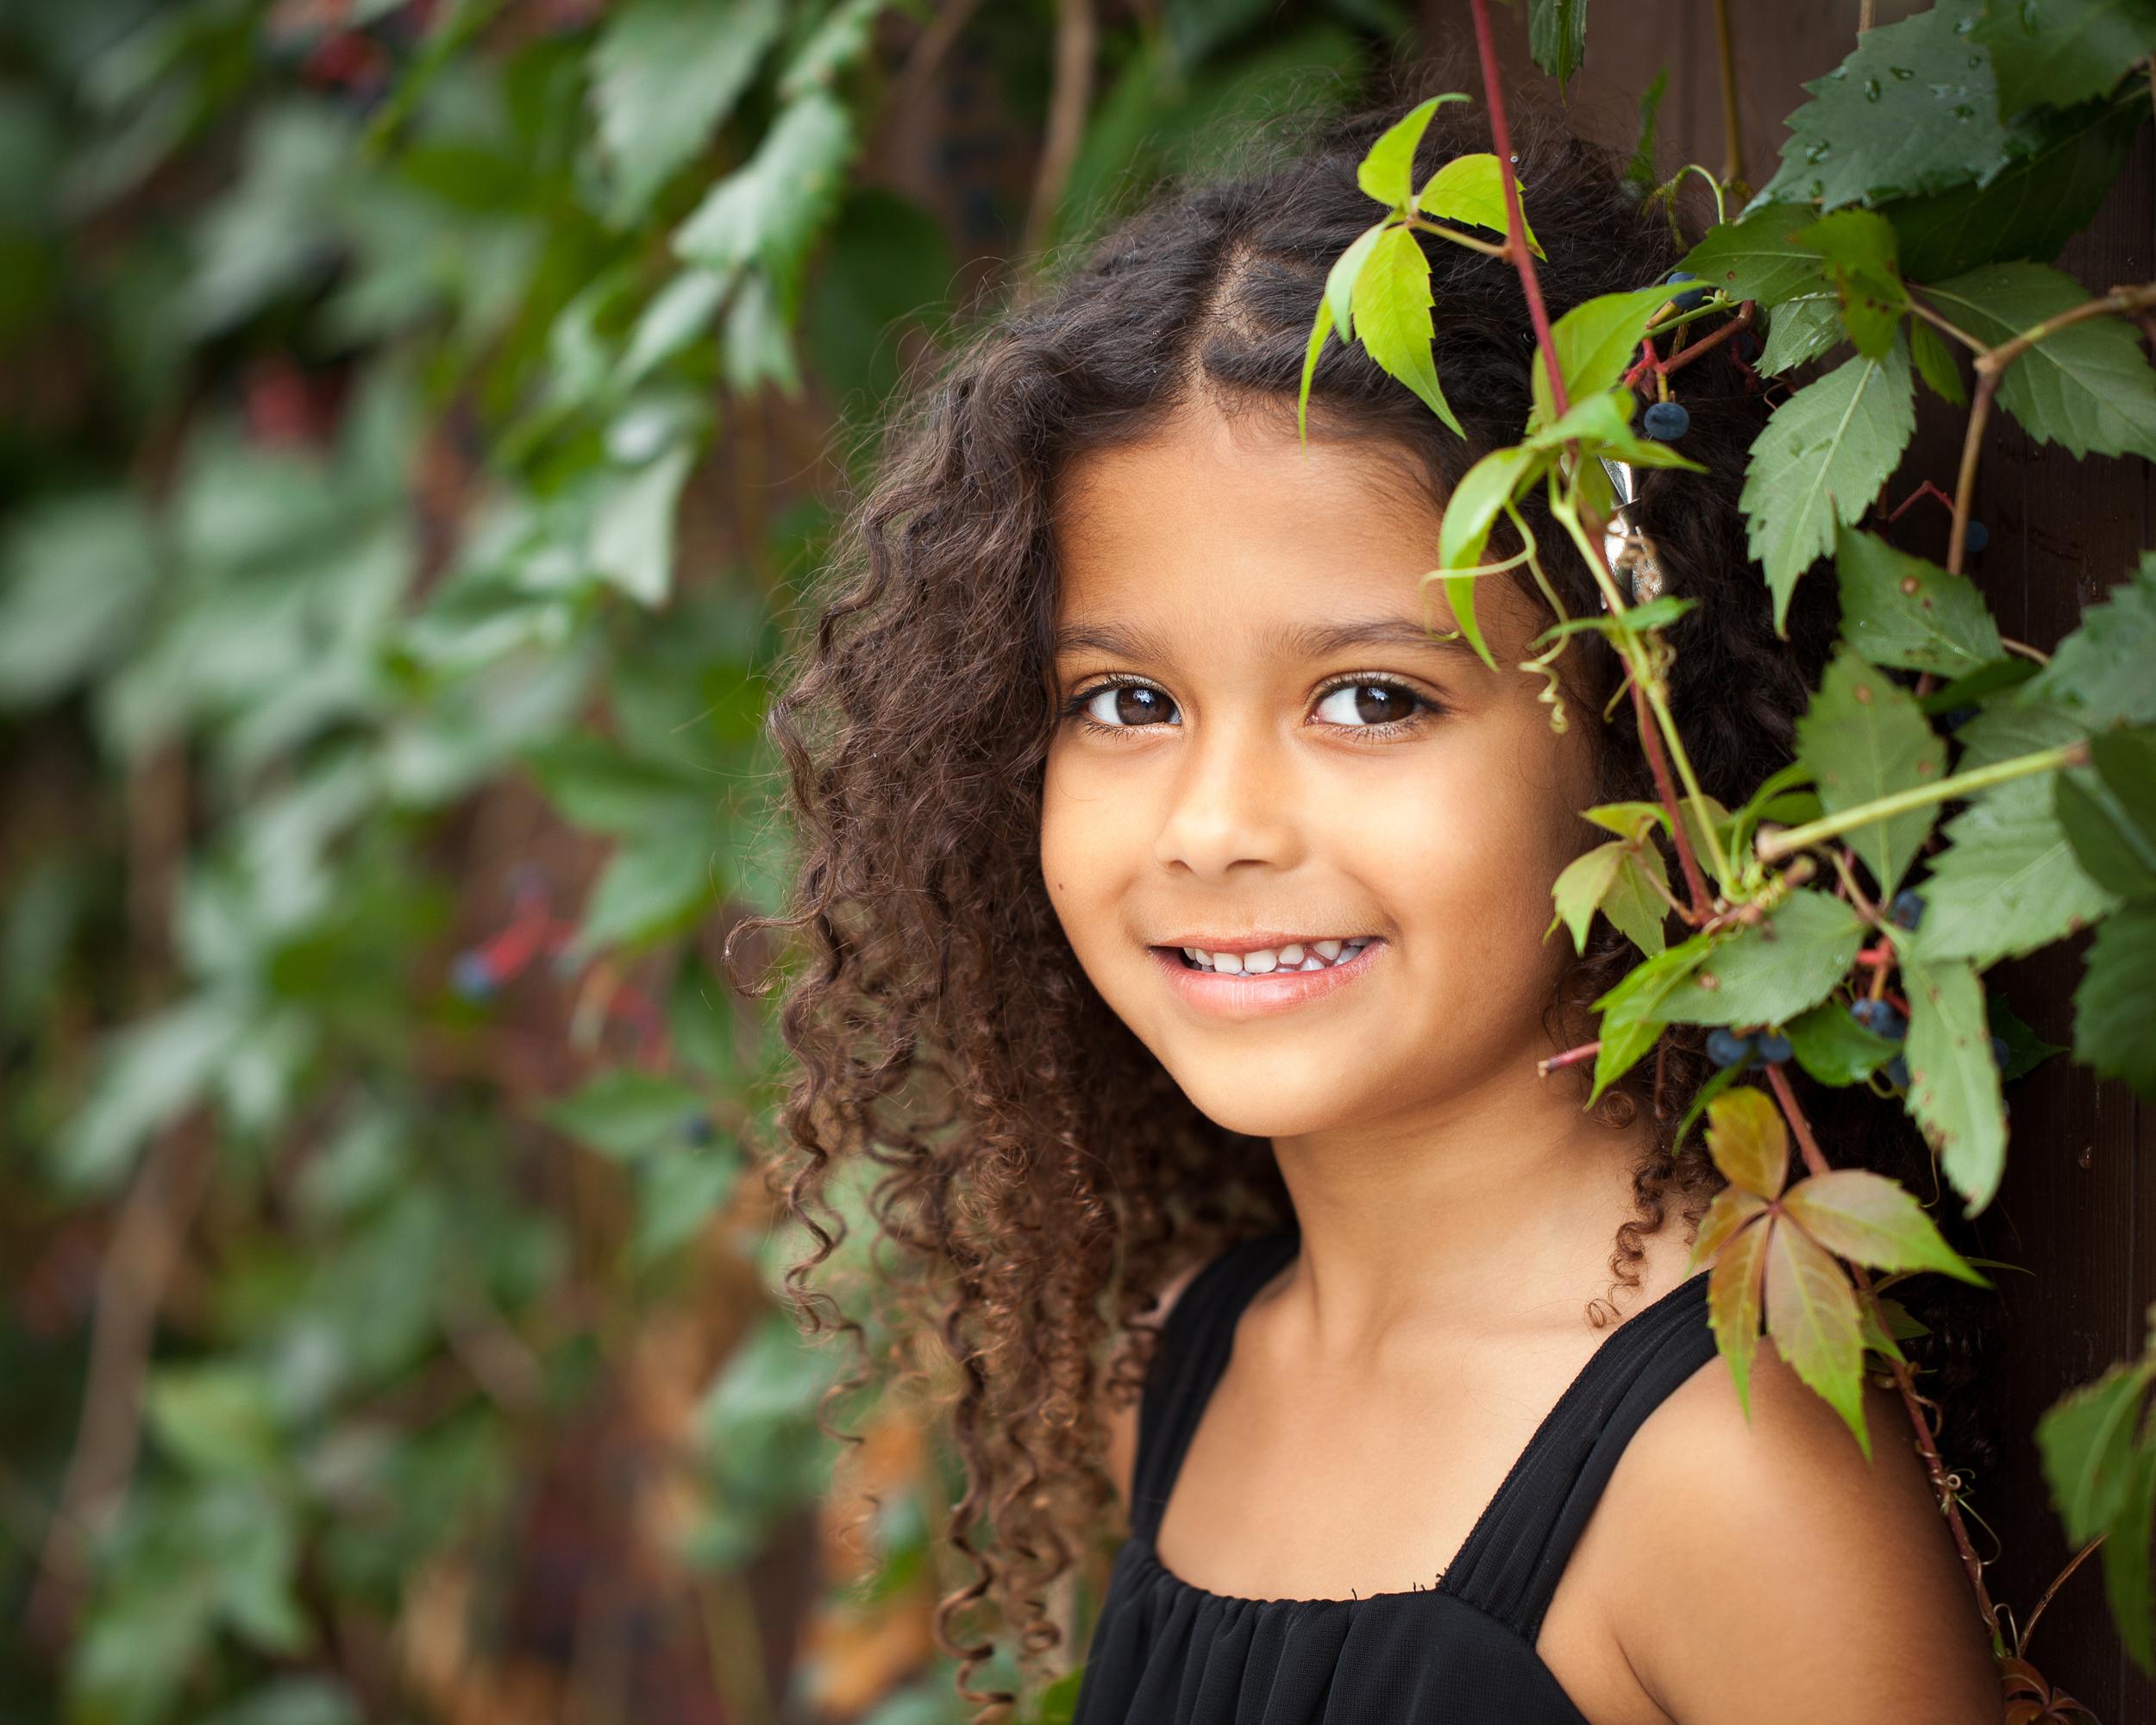 Child Photographer - Fargo, ND